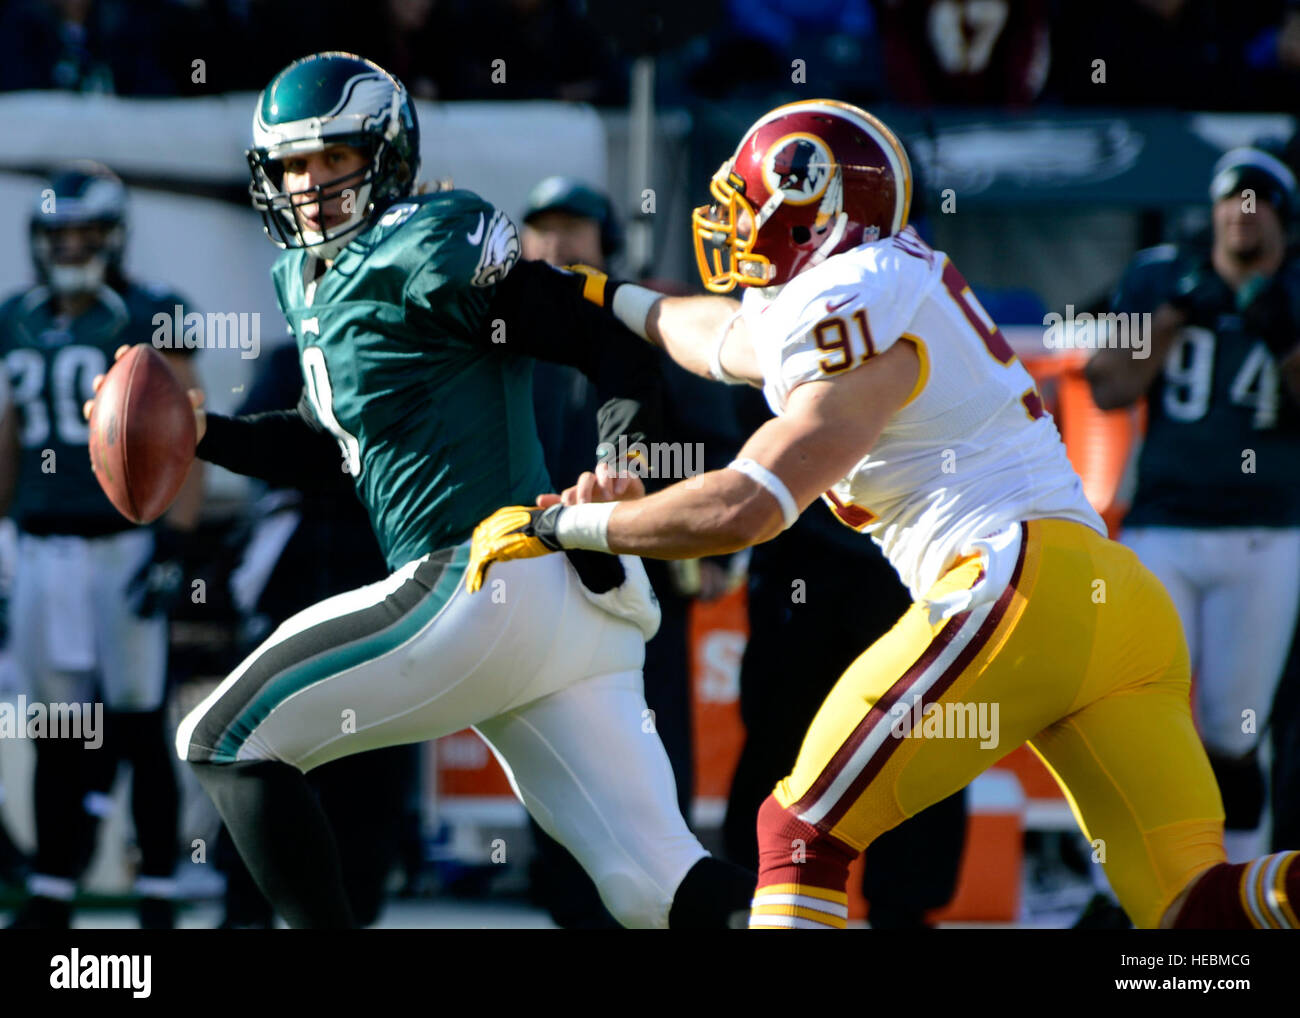 Washington Redskins outside linebacker Ryan Kerrigan attempts to sack Philadelphia Eagles quarterback Nick Foles - Stock Image